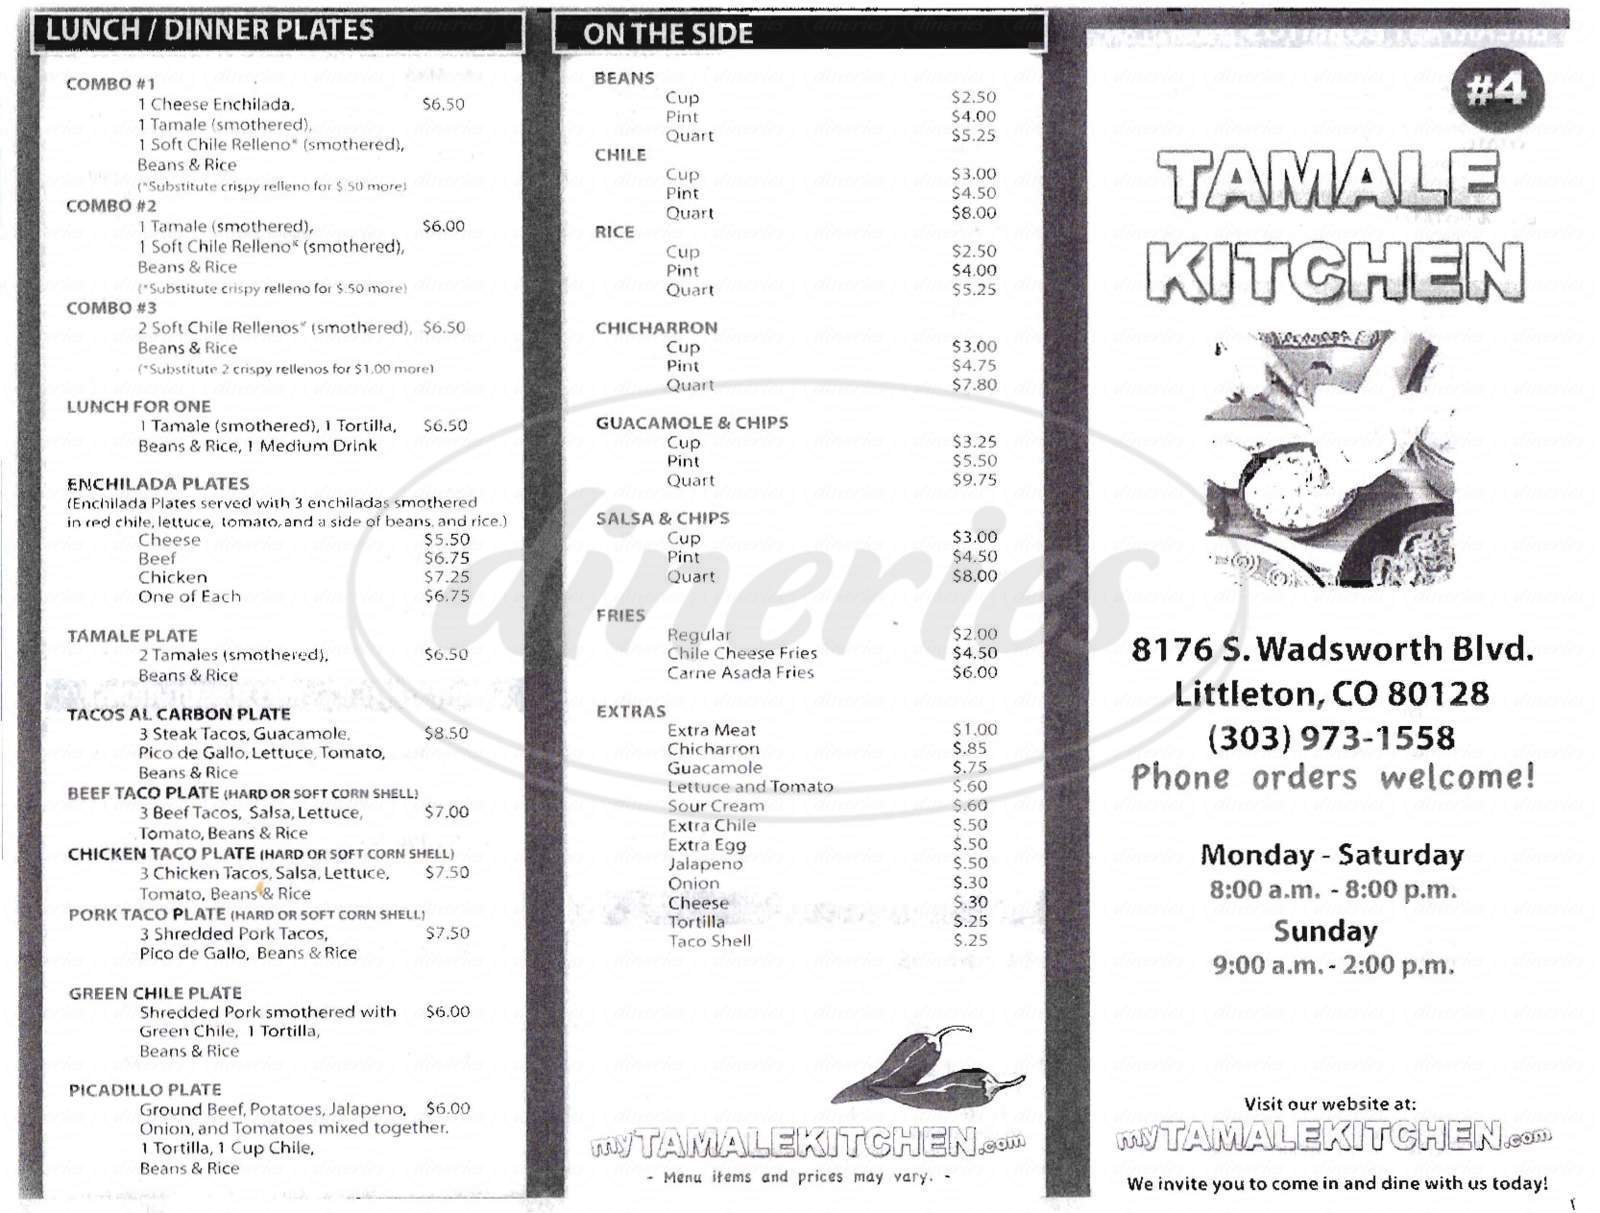 menu for Tamale Kitchen